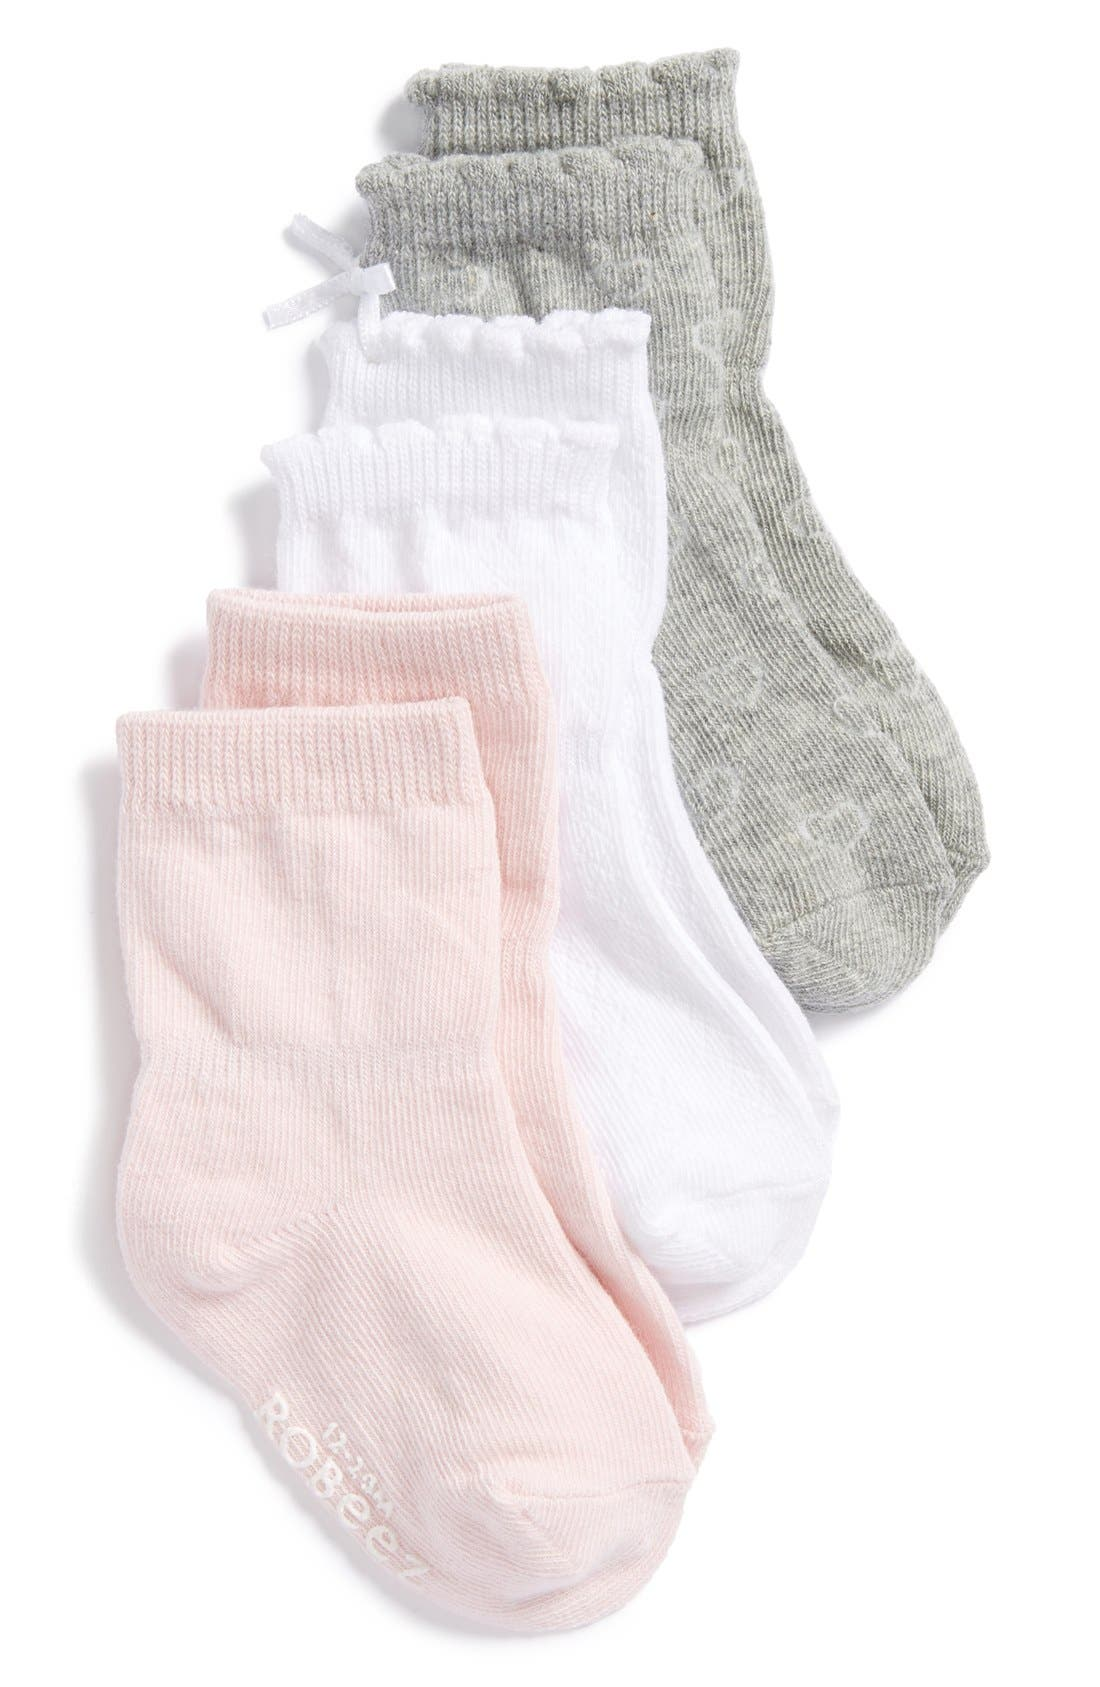 Kickproof Ankle Socks,                         Main,                         color, 650